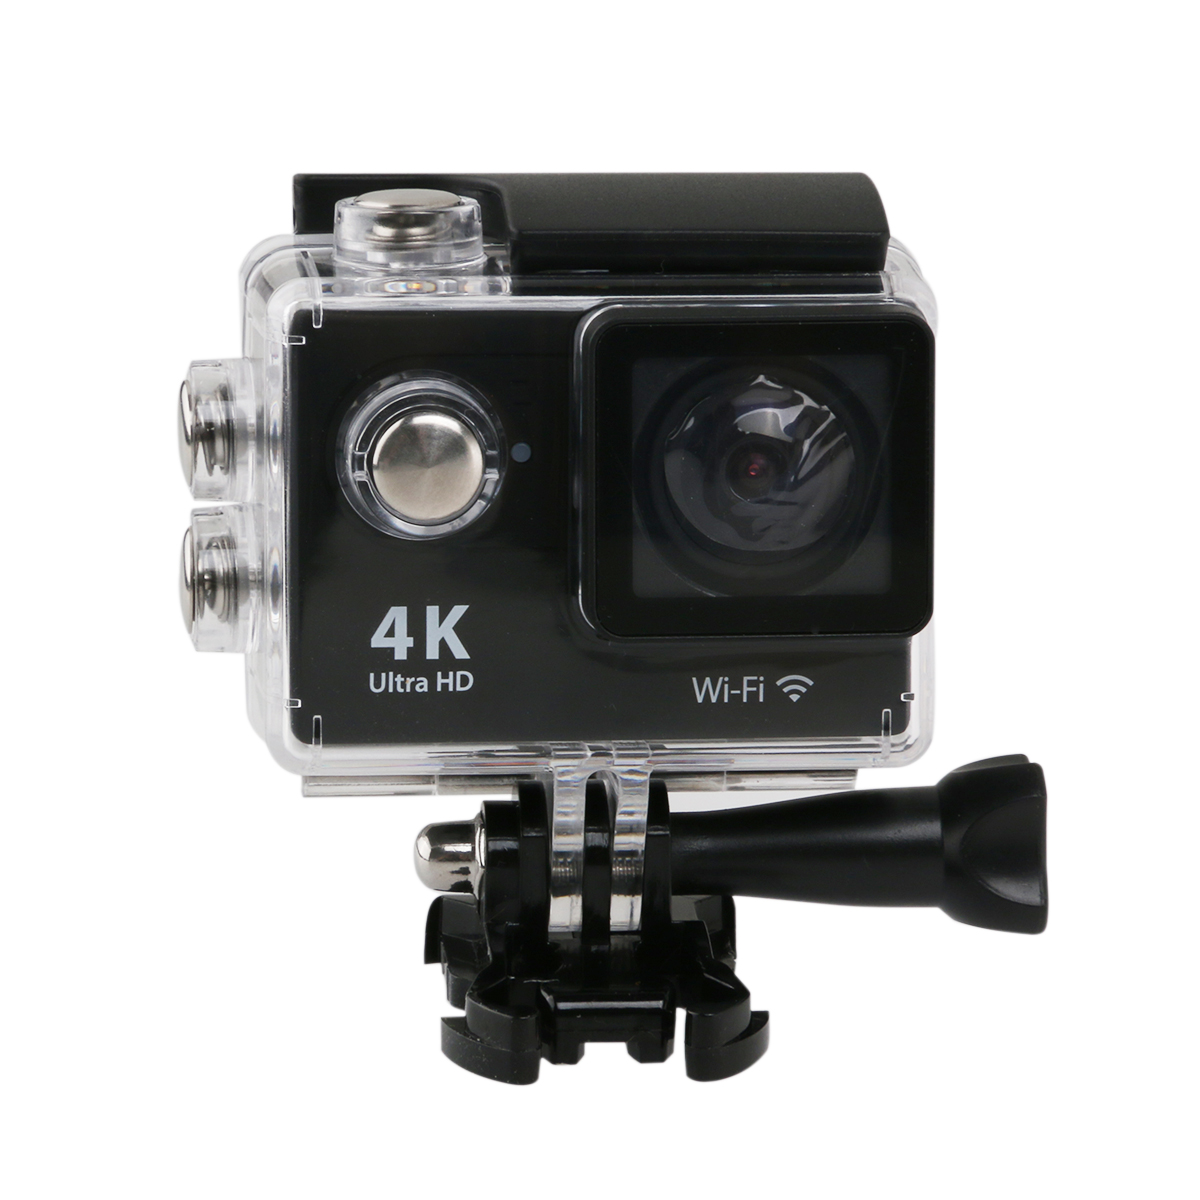 30M Waterproof 2.0-inch 4K Ultra-HD WIFI 170 Degrees Wide Angle Digital Camera DV Camcorder with EU-plug Power Adapter(China (Mainland))